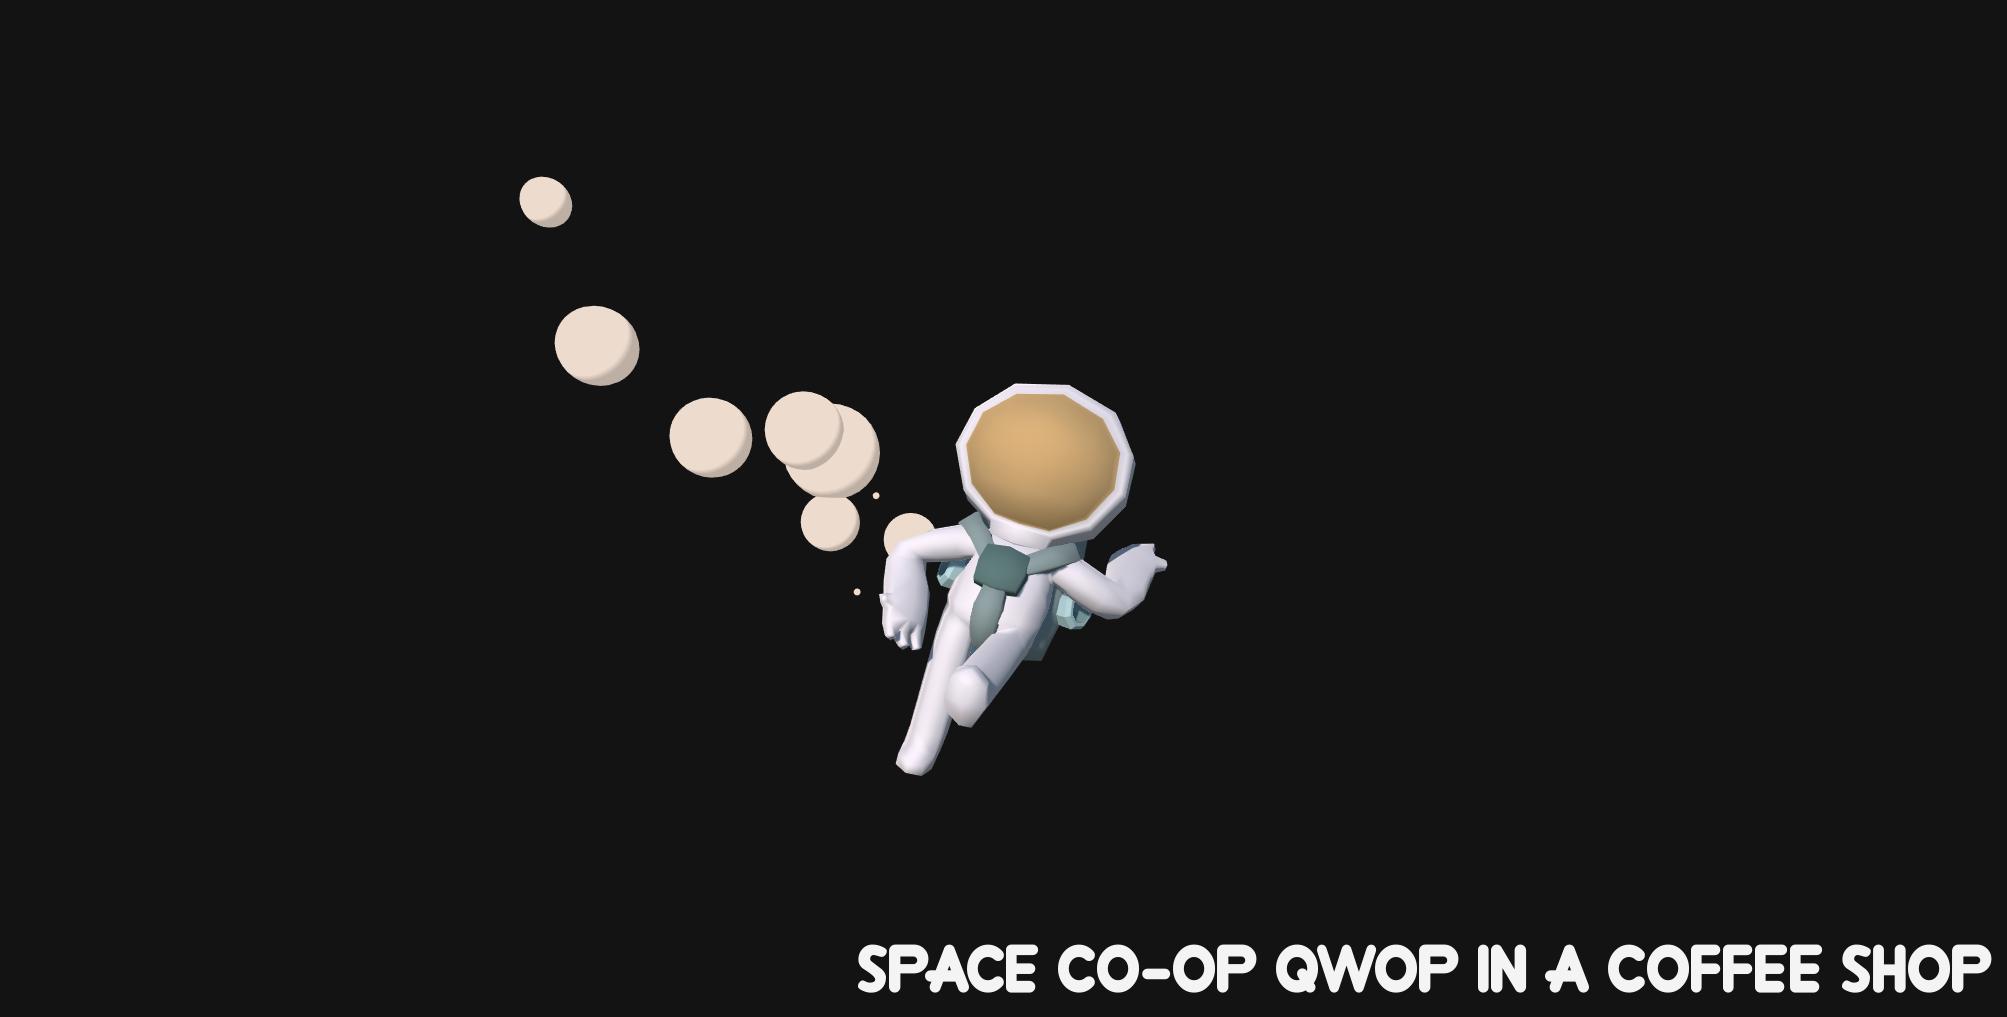 Space Co-op Qwop in a Coffee Shop